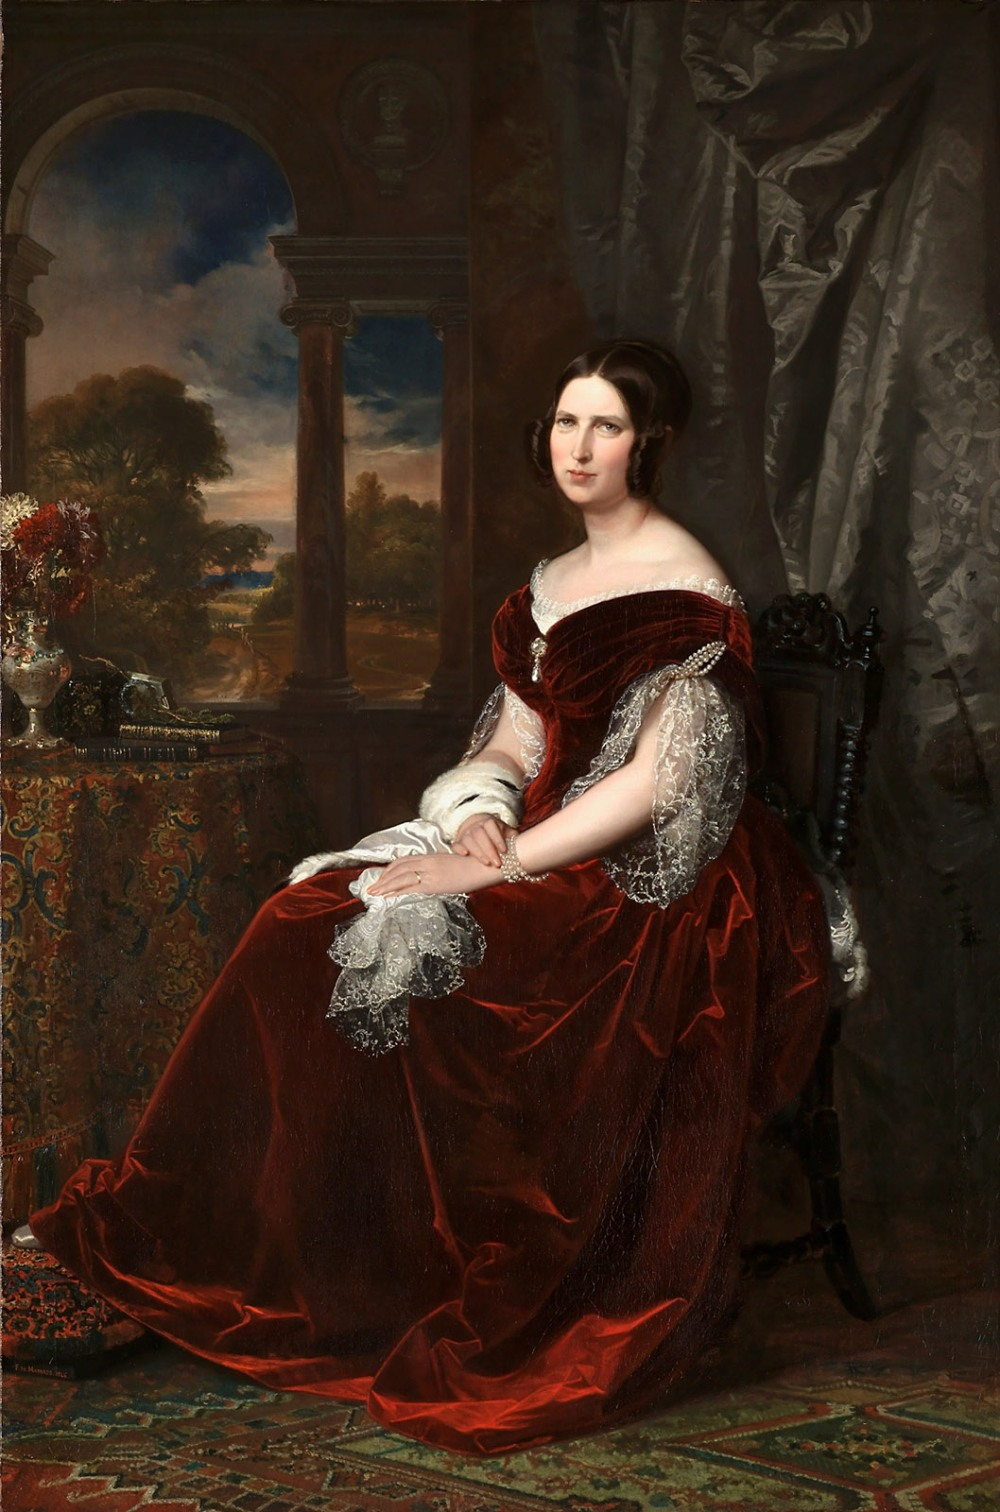 Federico de Madrazo. Sabina Seupham Spalding. 1846. Museo Nacional del Prado. Madrid.